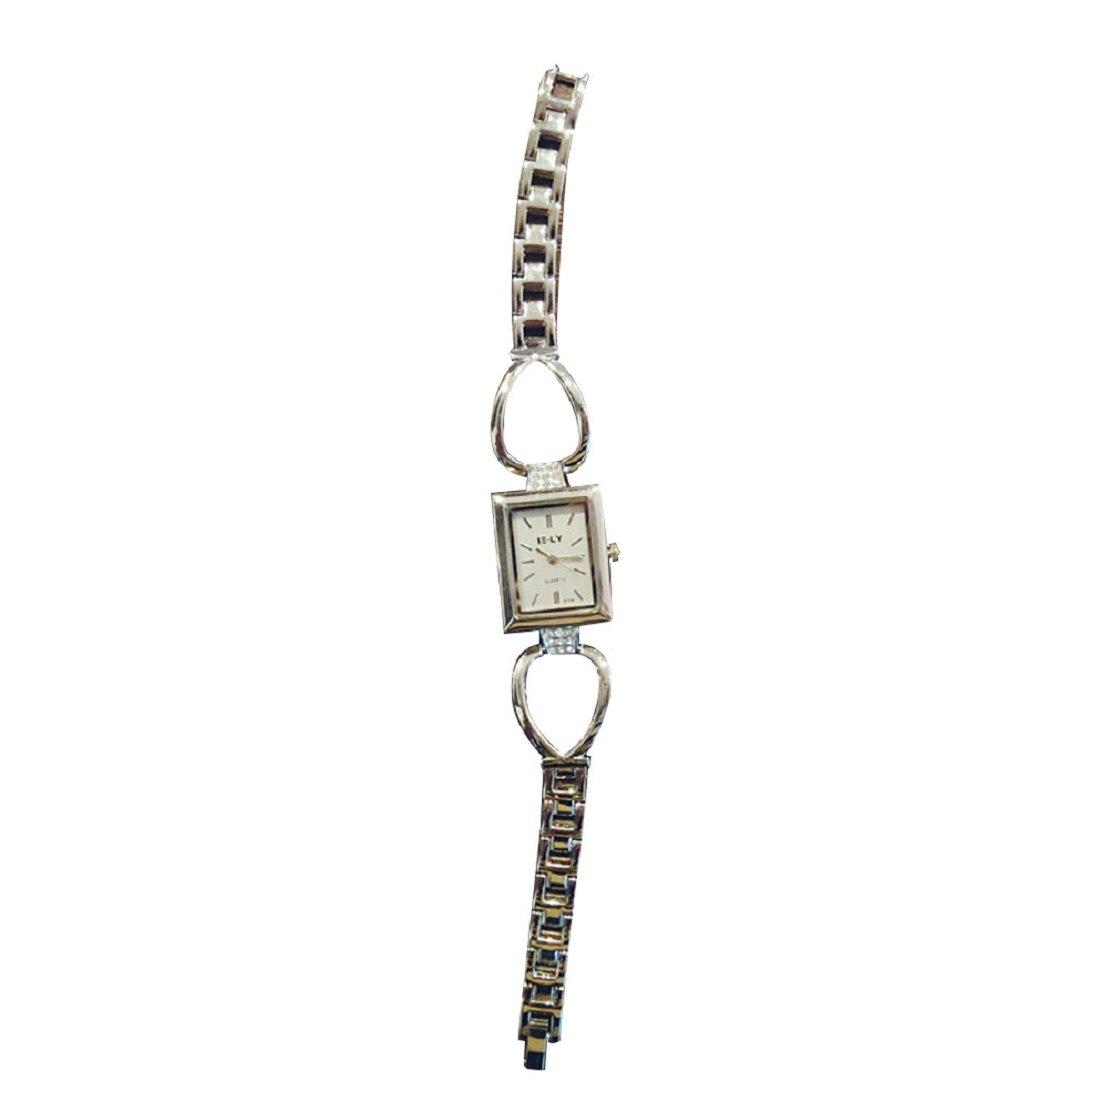 Amazon.com: Women Watch, Lookatool Fashion Female Bracelet Rectangular Fashion Temperament Watch: Lookatool: Watches